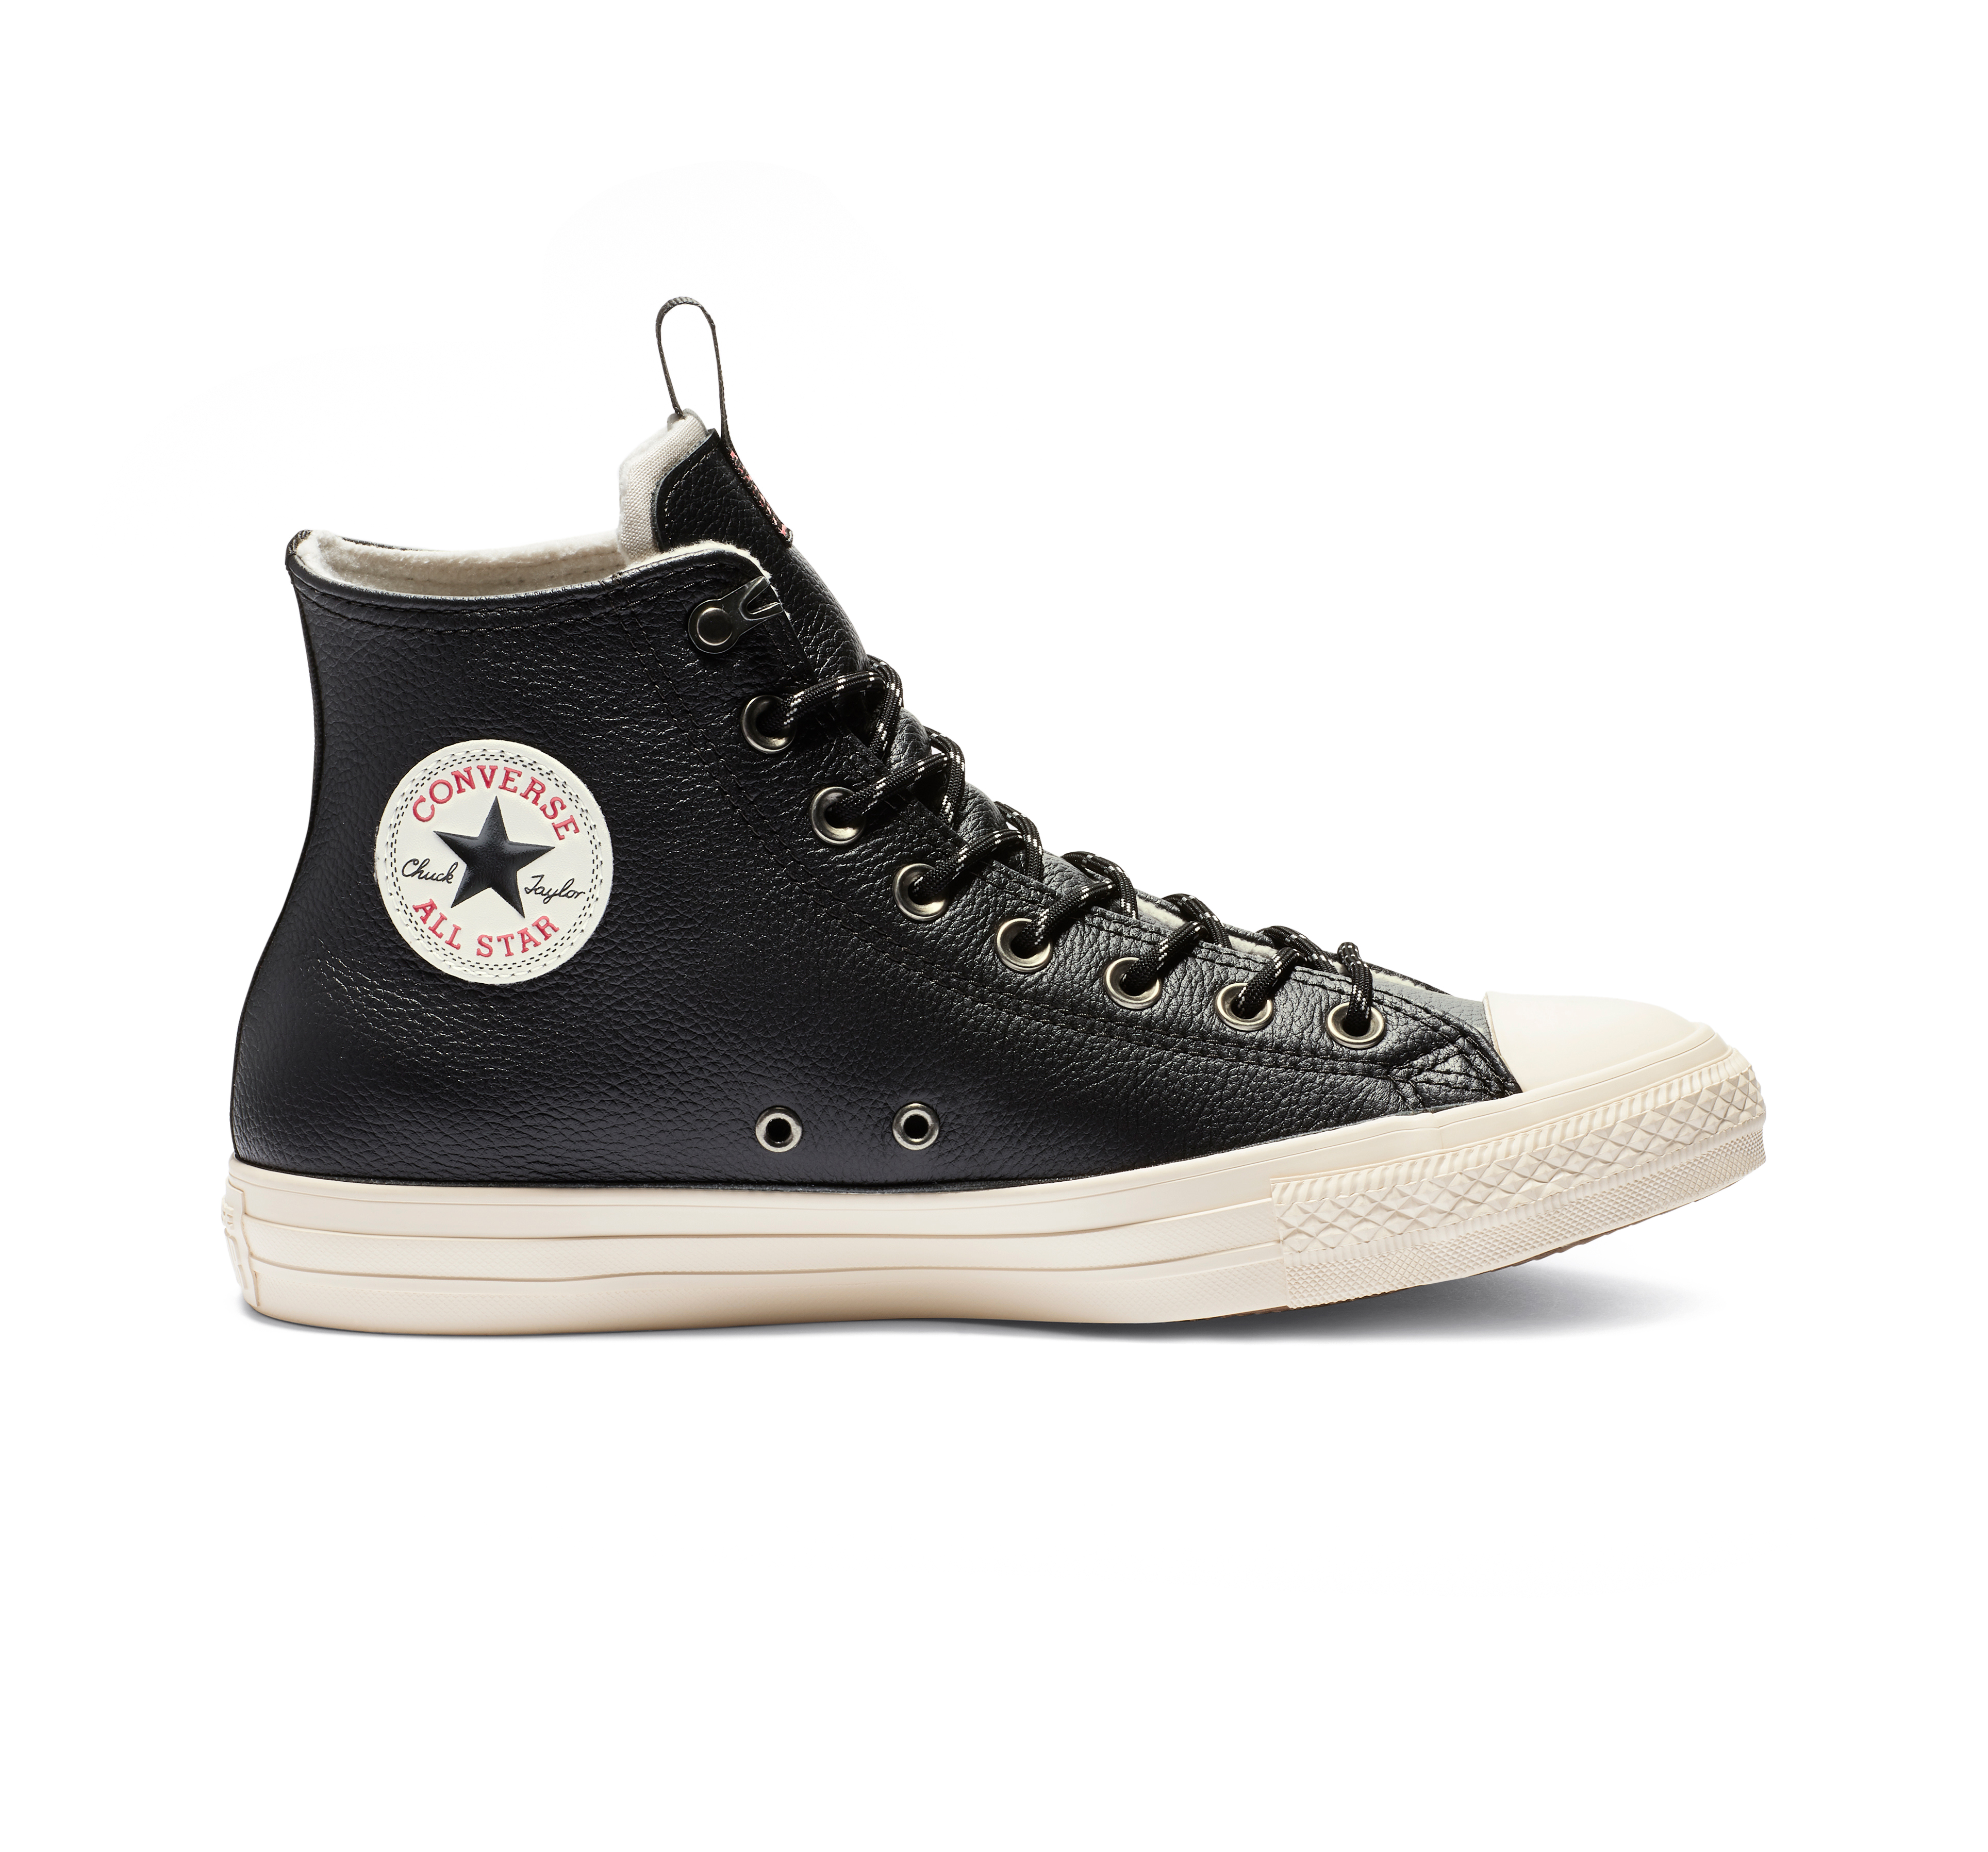 Escupir Escuchando amenazar  Chuck Taylor All Star Desert Storm Leather High Top | Chuck taylors, Leather  converse, Black chucks